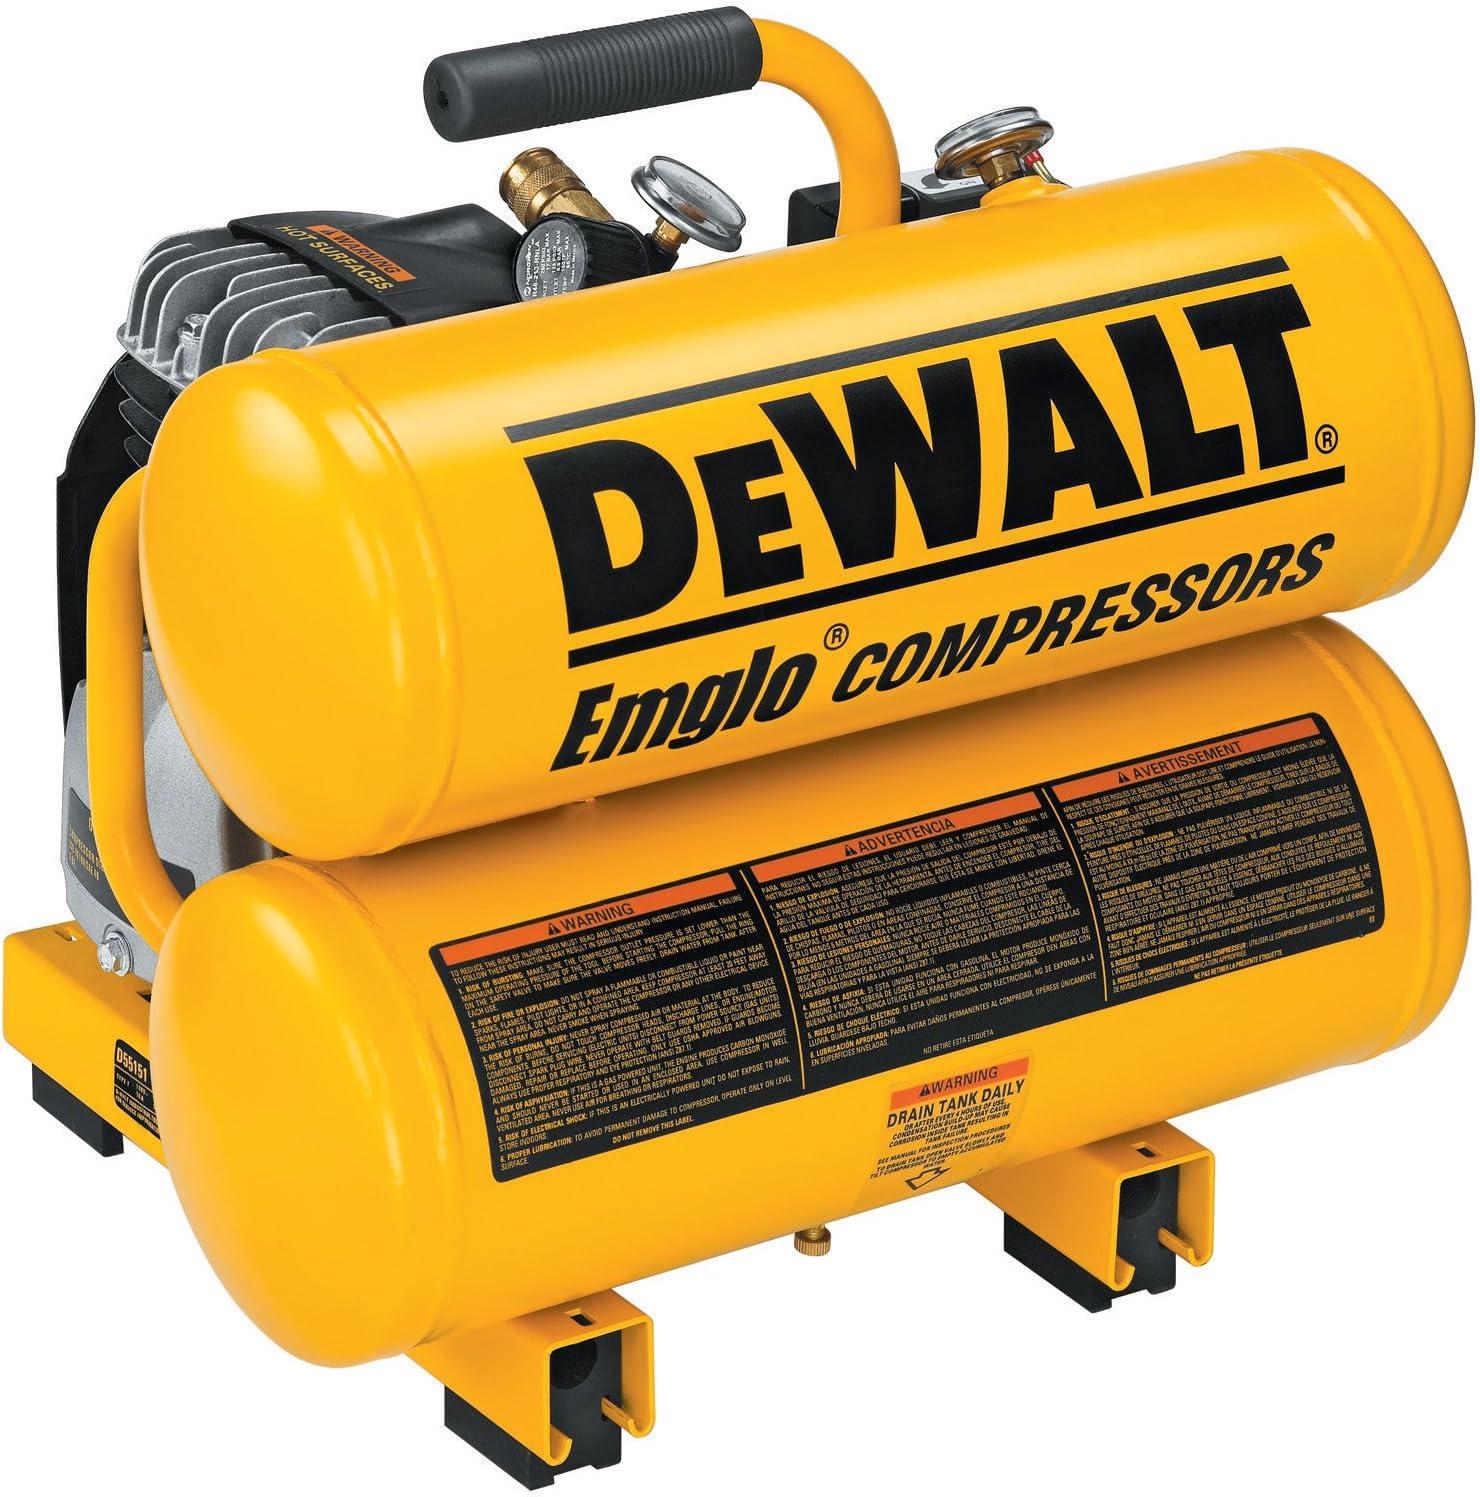 DEWALT D55151 Oiled Twin Hot Dog Compressor